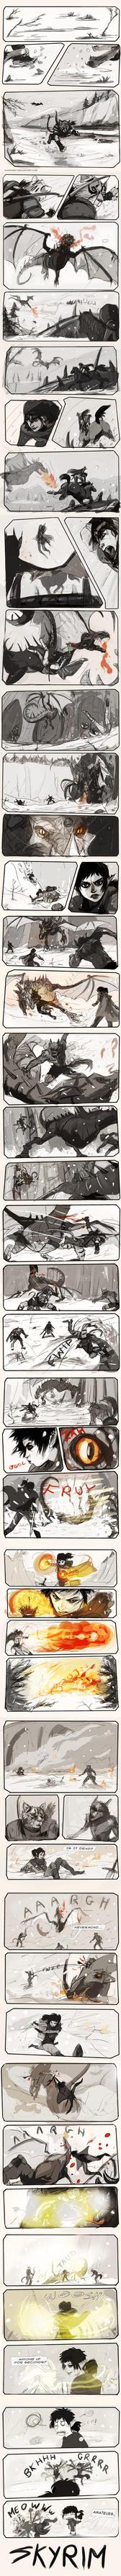 Skyrim dragon slaying by chakhabit